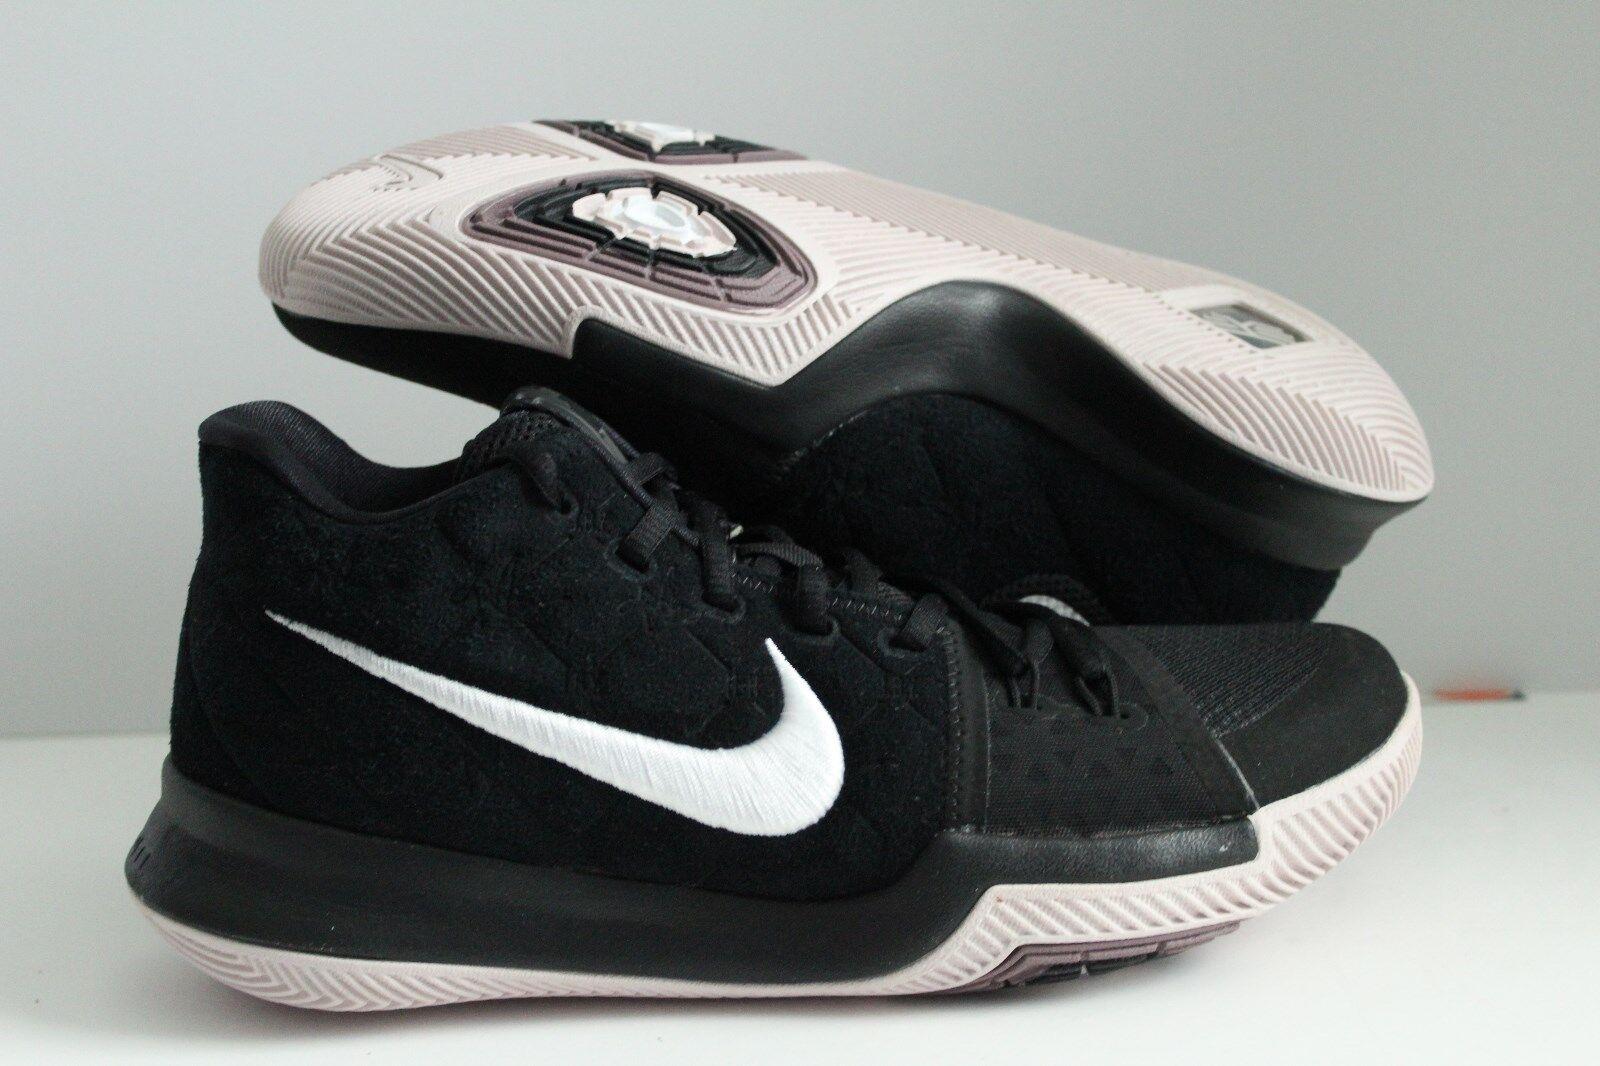 New Nike Uomo Kyrie 2 ID scarpe scarpe scarpe nero bianca and Silt rosso sz 9 [852395-010] 8e8887